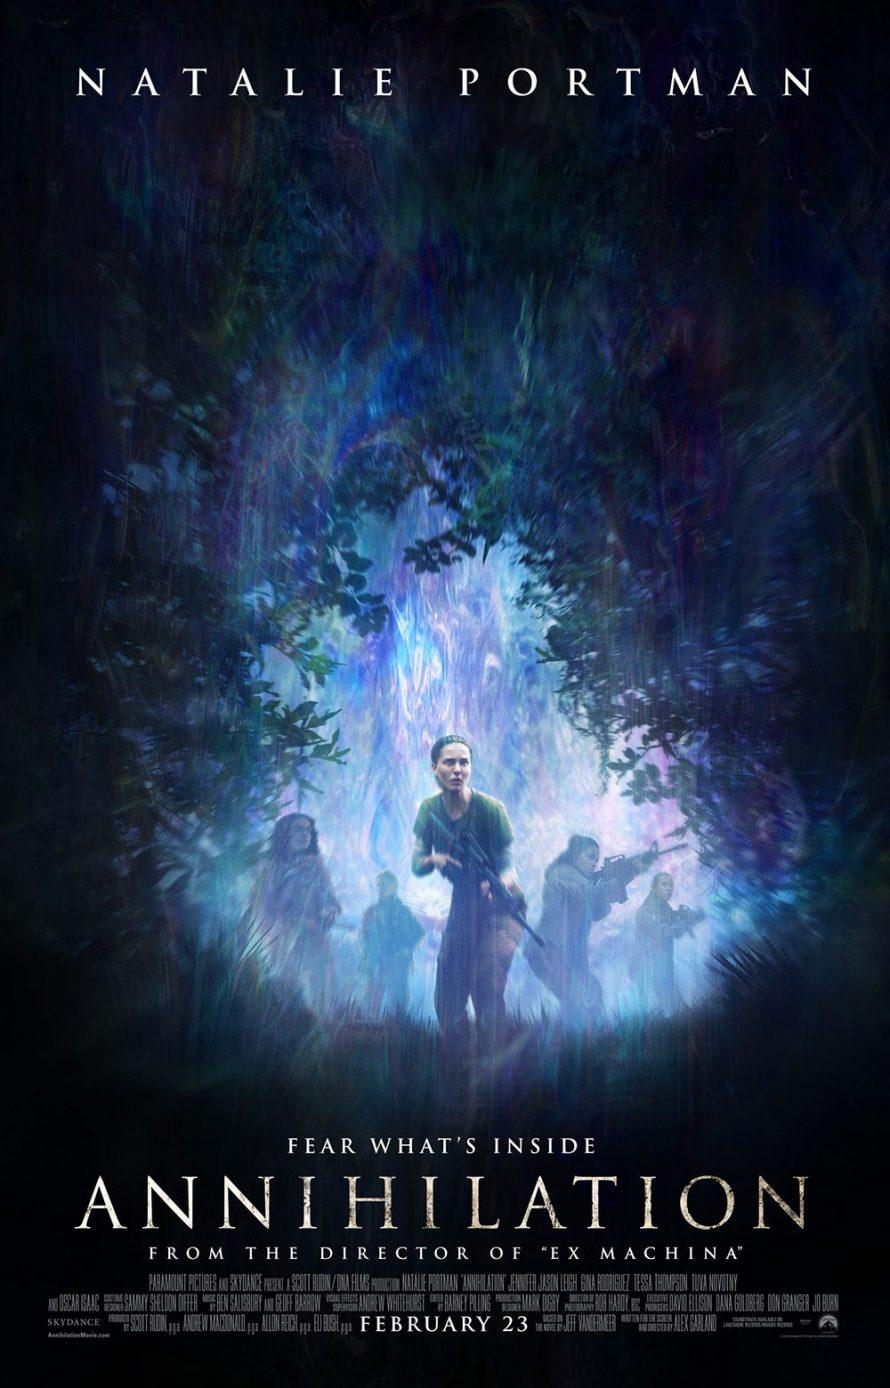 DVD & Blu-ray: 05/29/2018